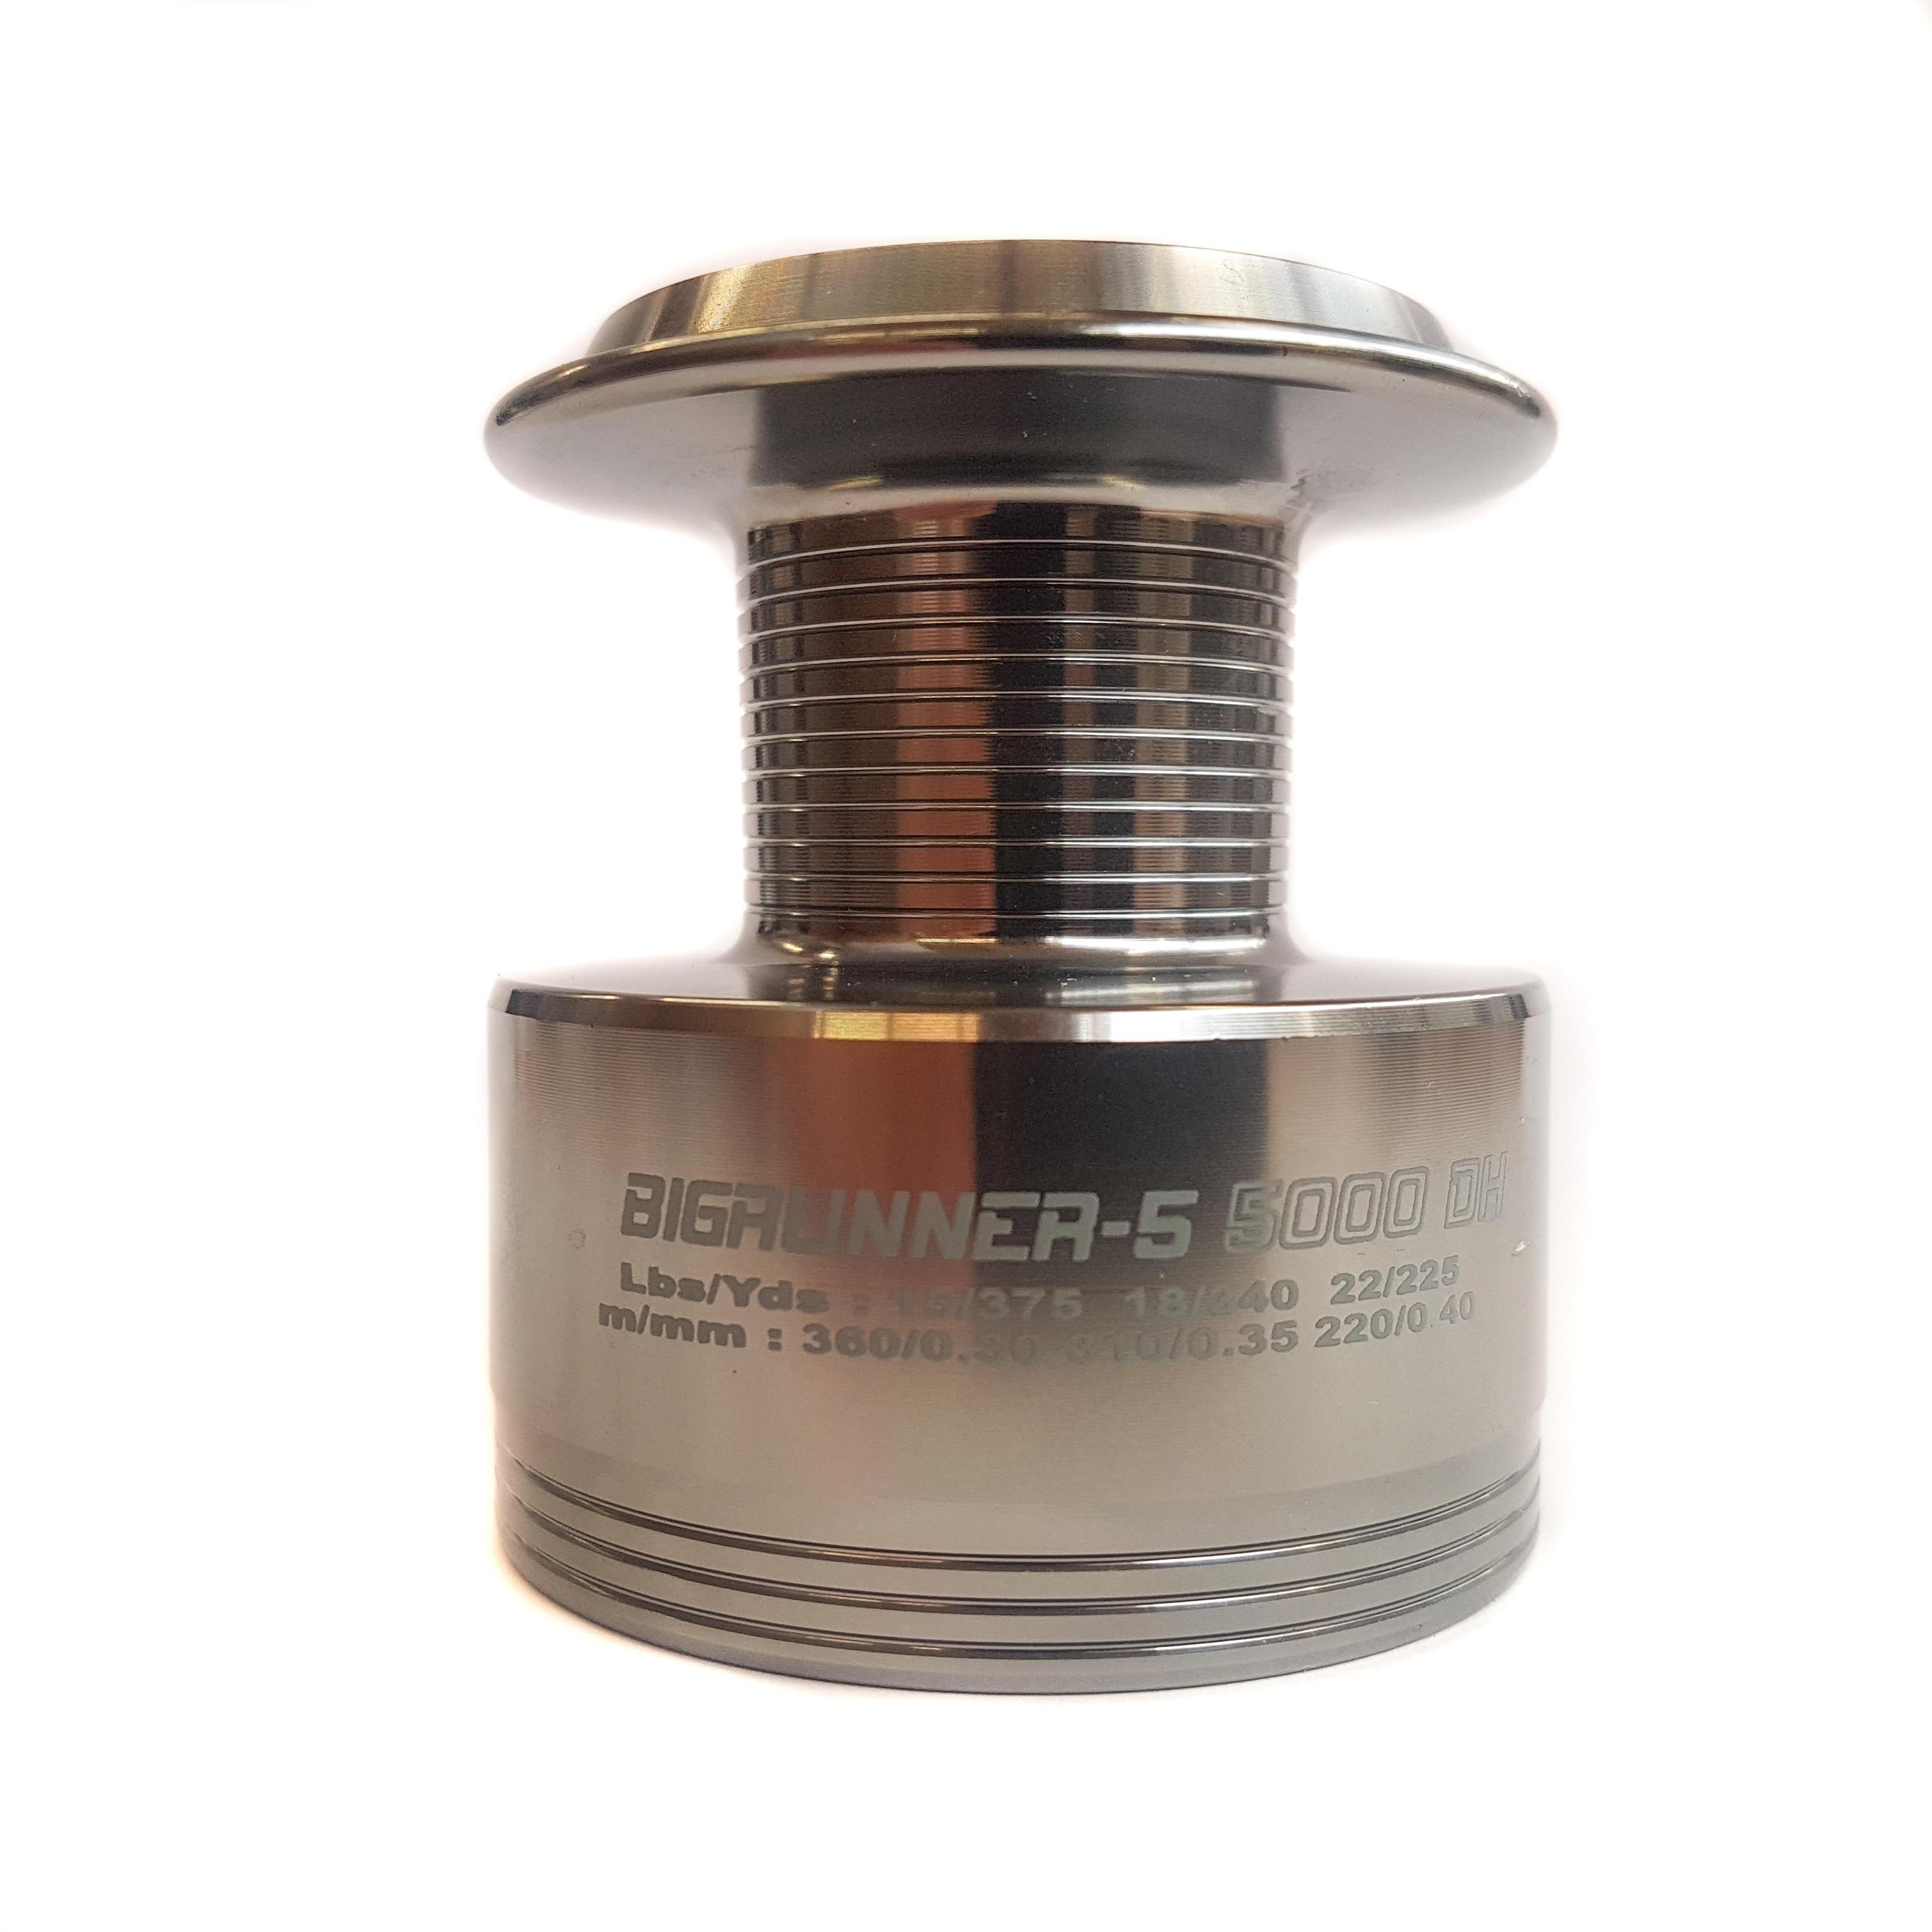 Tambur Bigrunner-5 5000 DH imagine produs